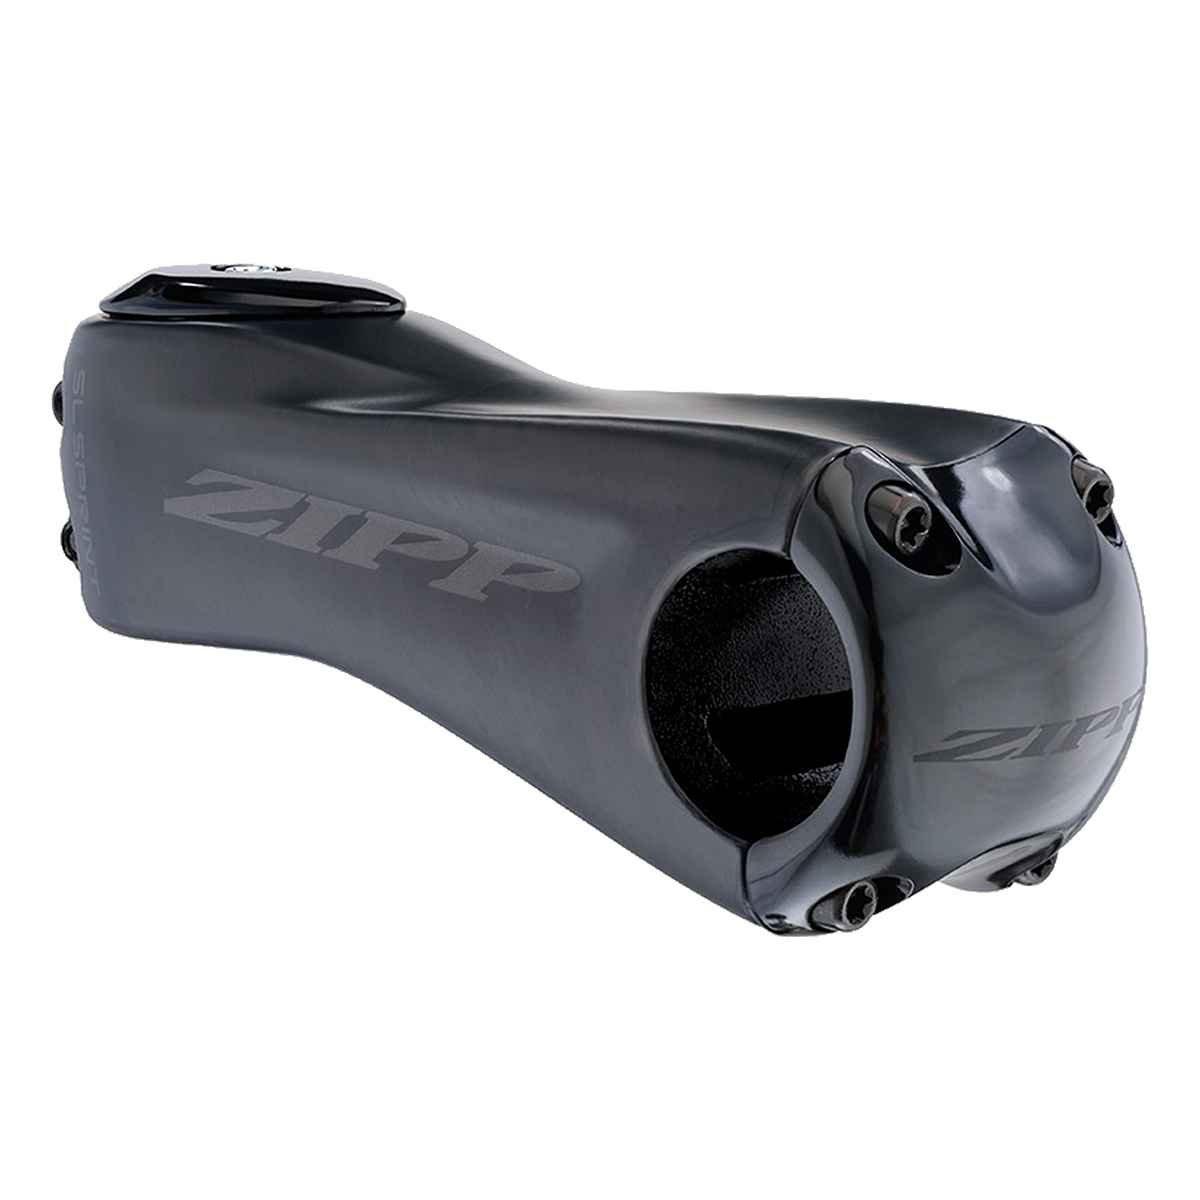 Zipp SL SPRINTカーボンステム B06XNVC7SG 90mm/-12deg|Matte Black/Black Matte Black/Black 90mm/-12deg